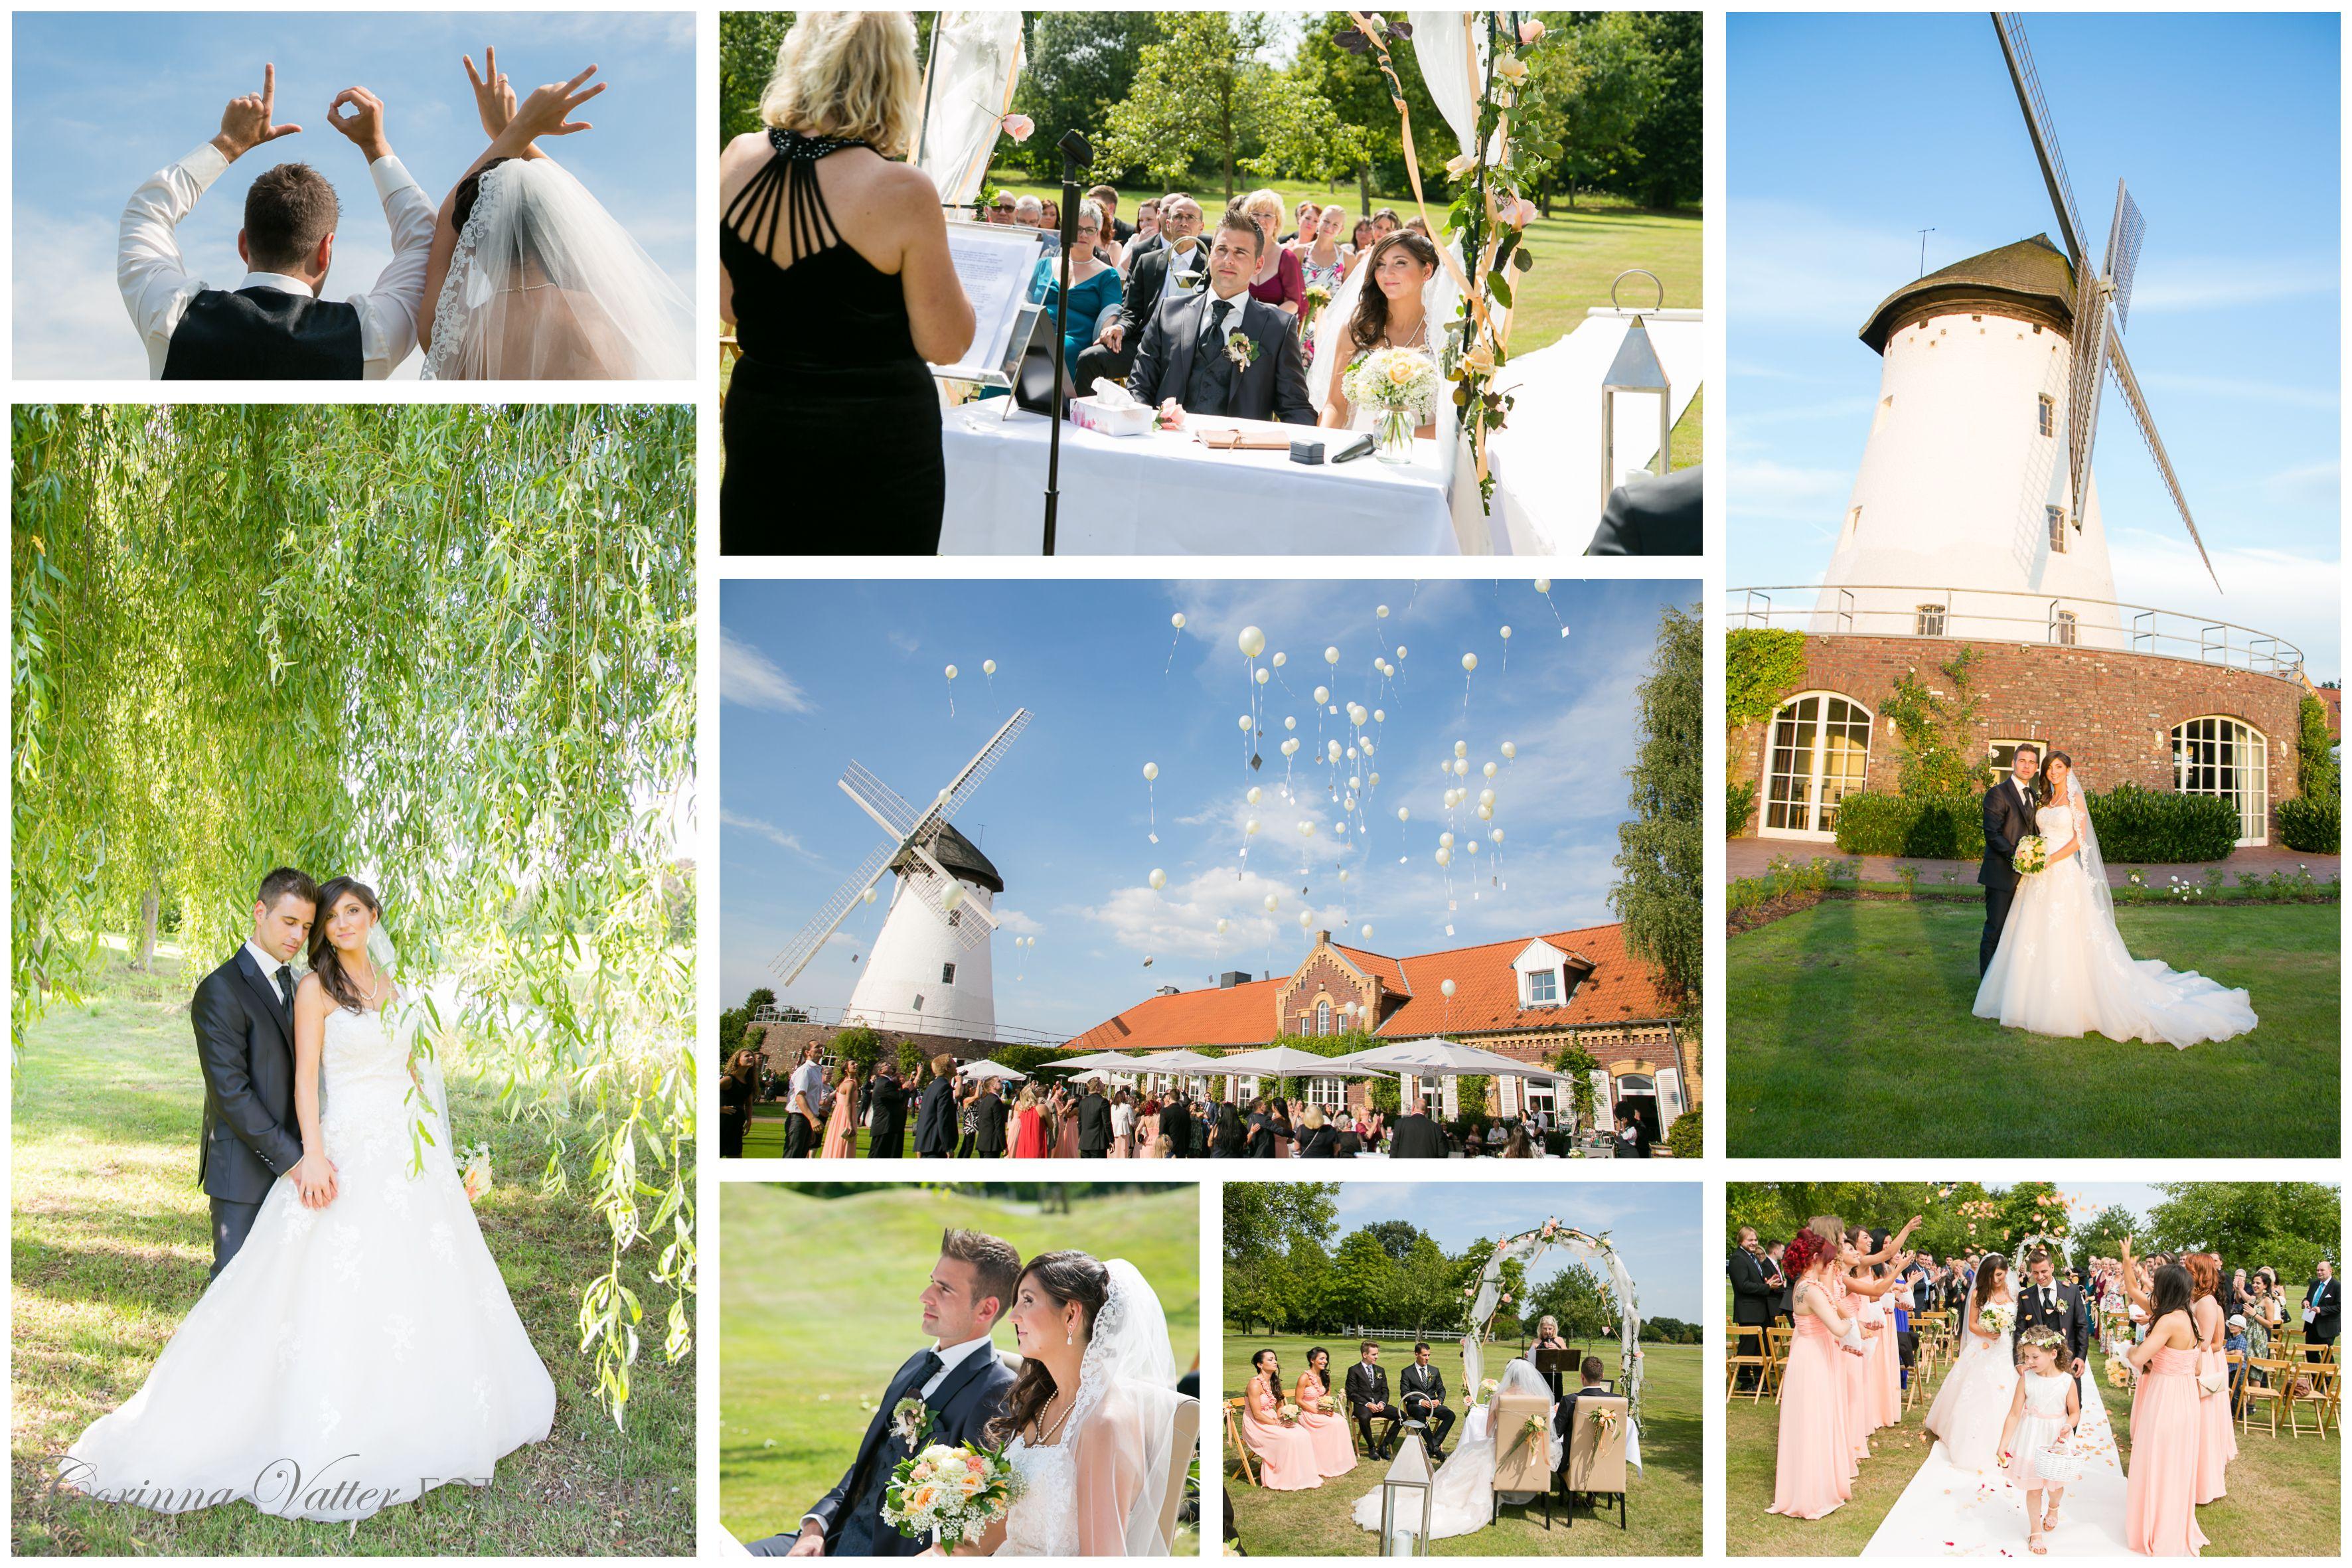 Pin Auf Hochzeit Location Nrw Germany Wedding Locations Germany